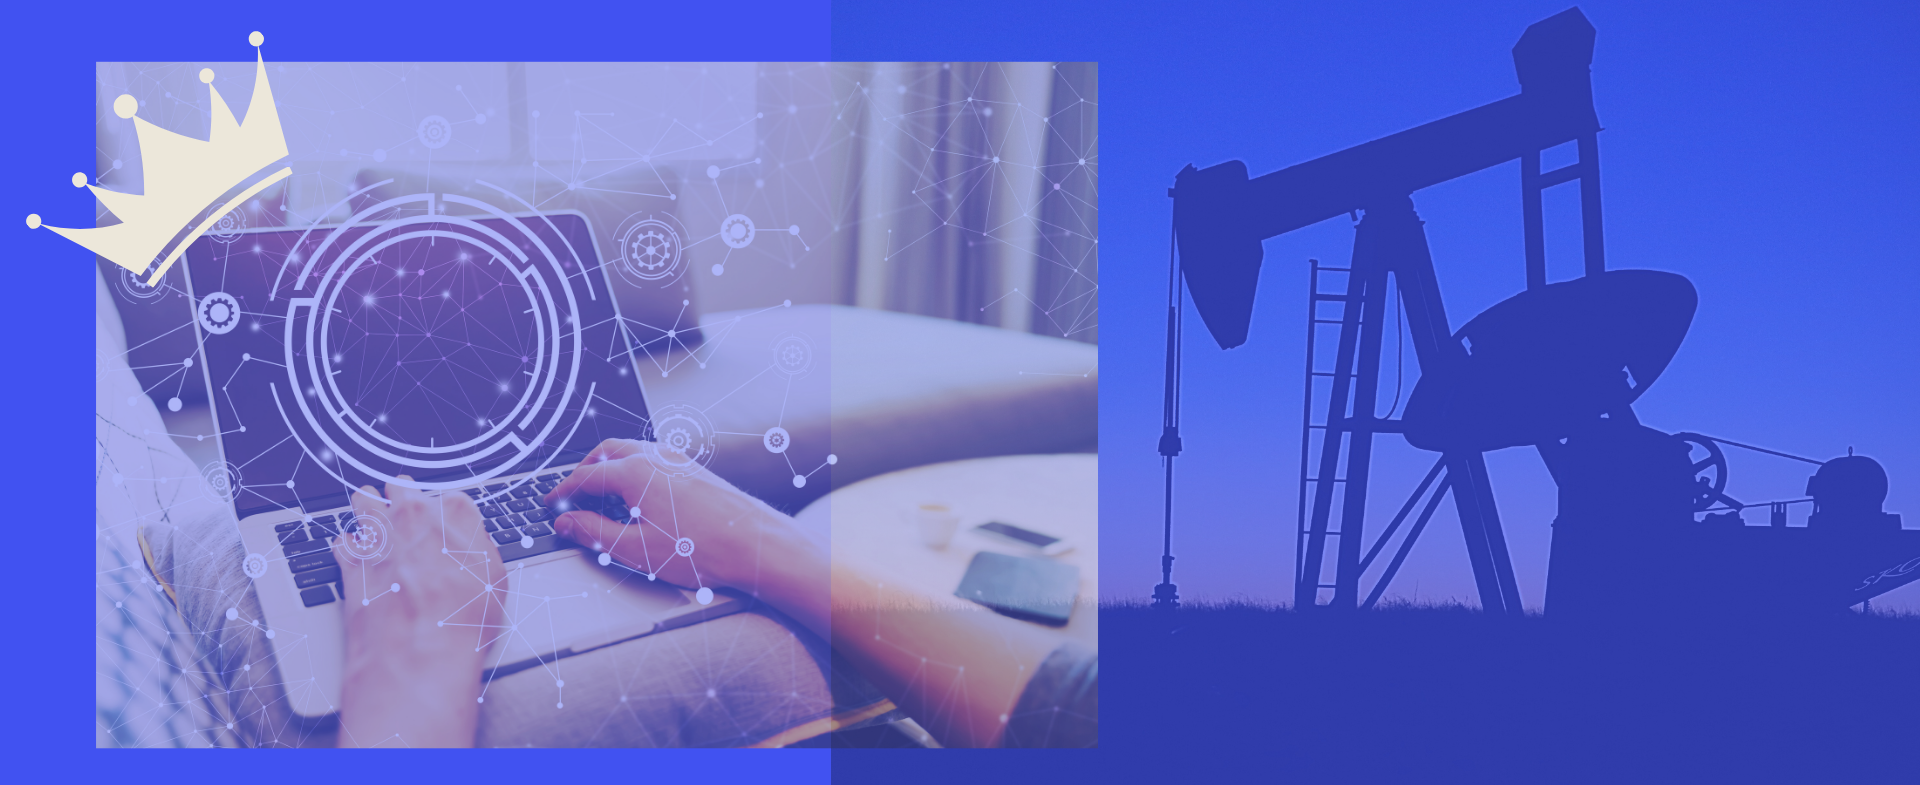 Tech Overtakes Petroleum To Signal Latin America's Digital Transformation